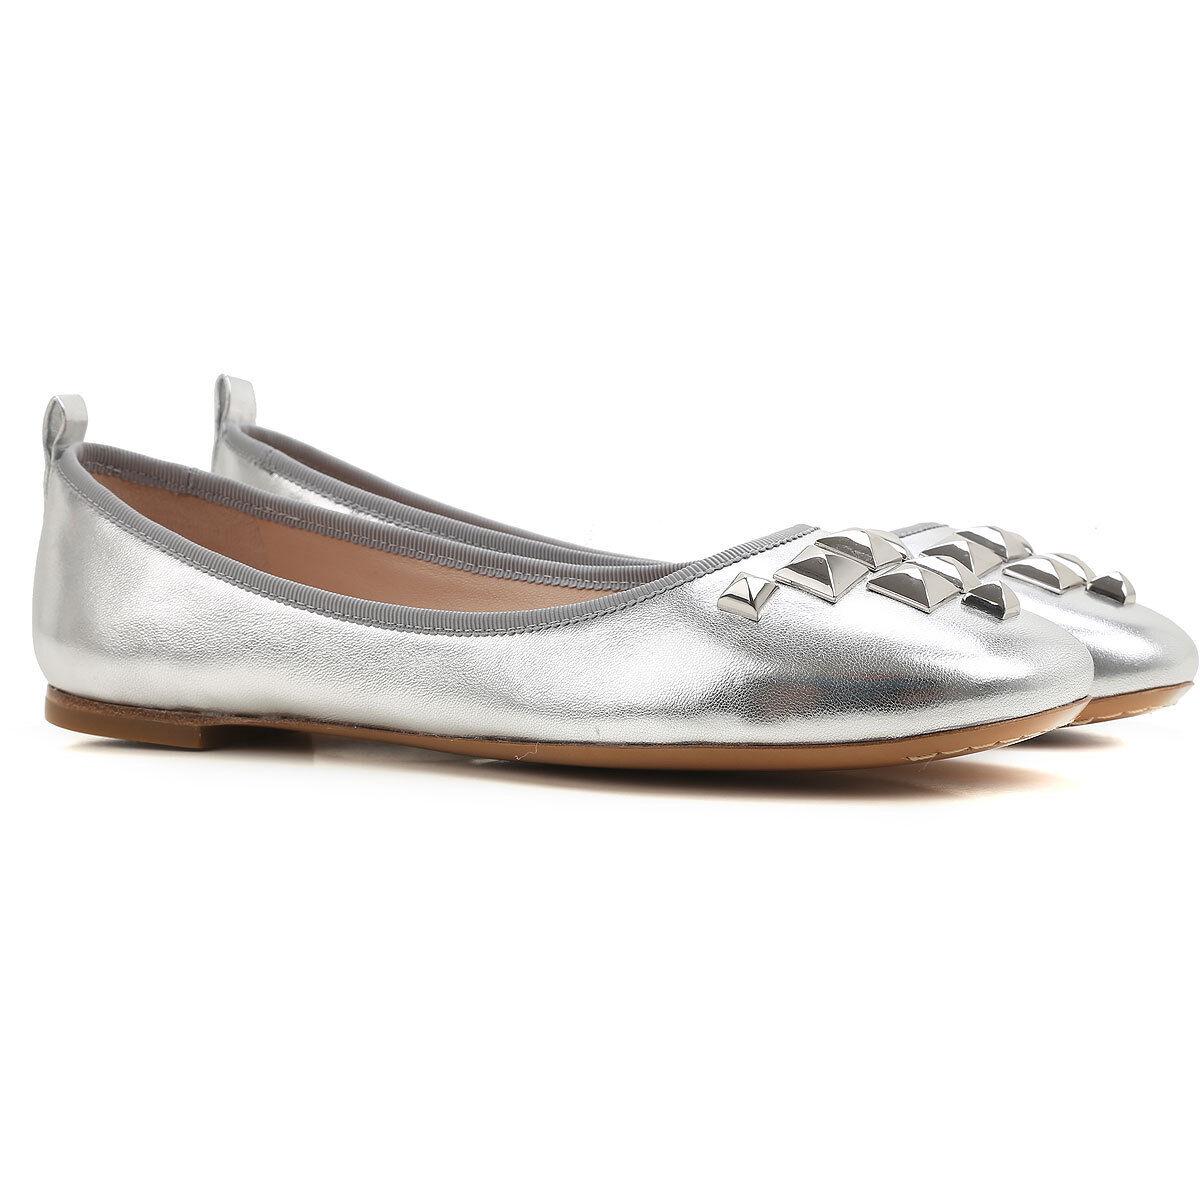 Marc Jacobs Cleo studded ballerina, Flats studded Cleo SILVER